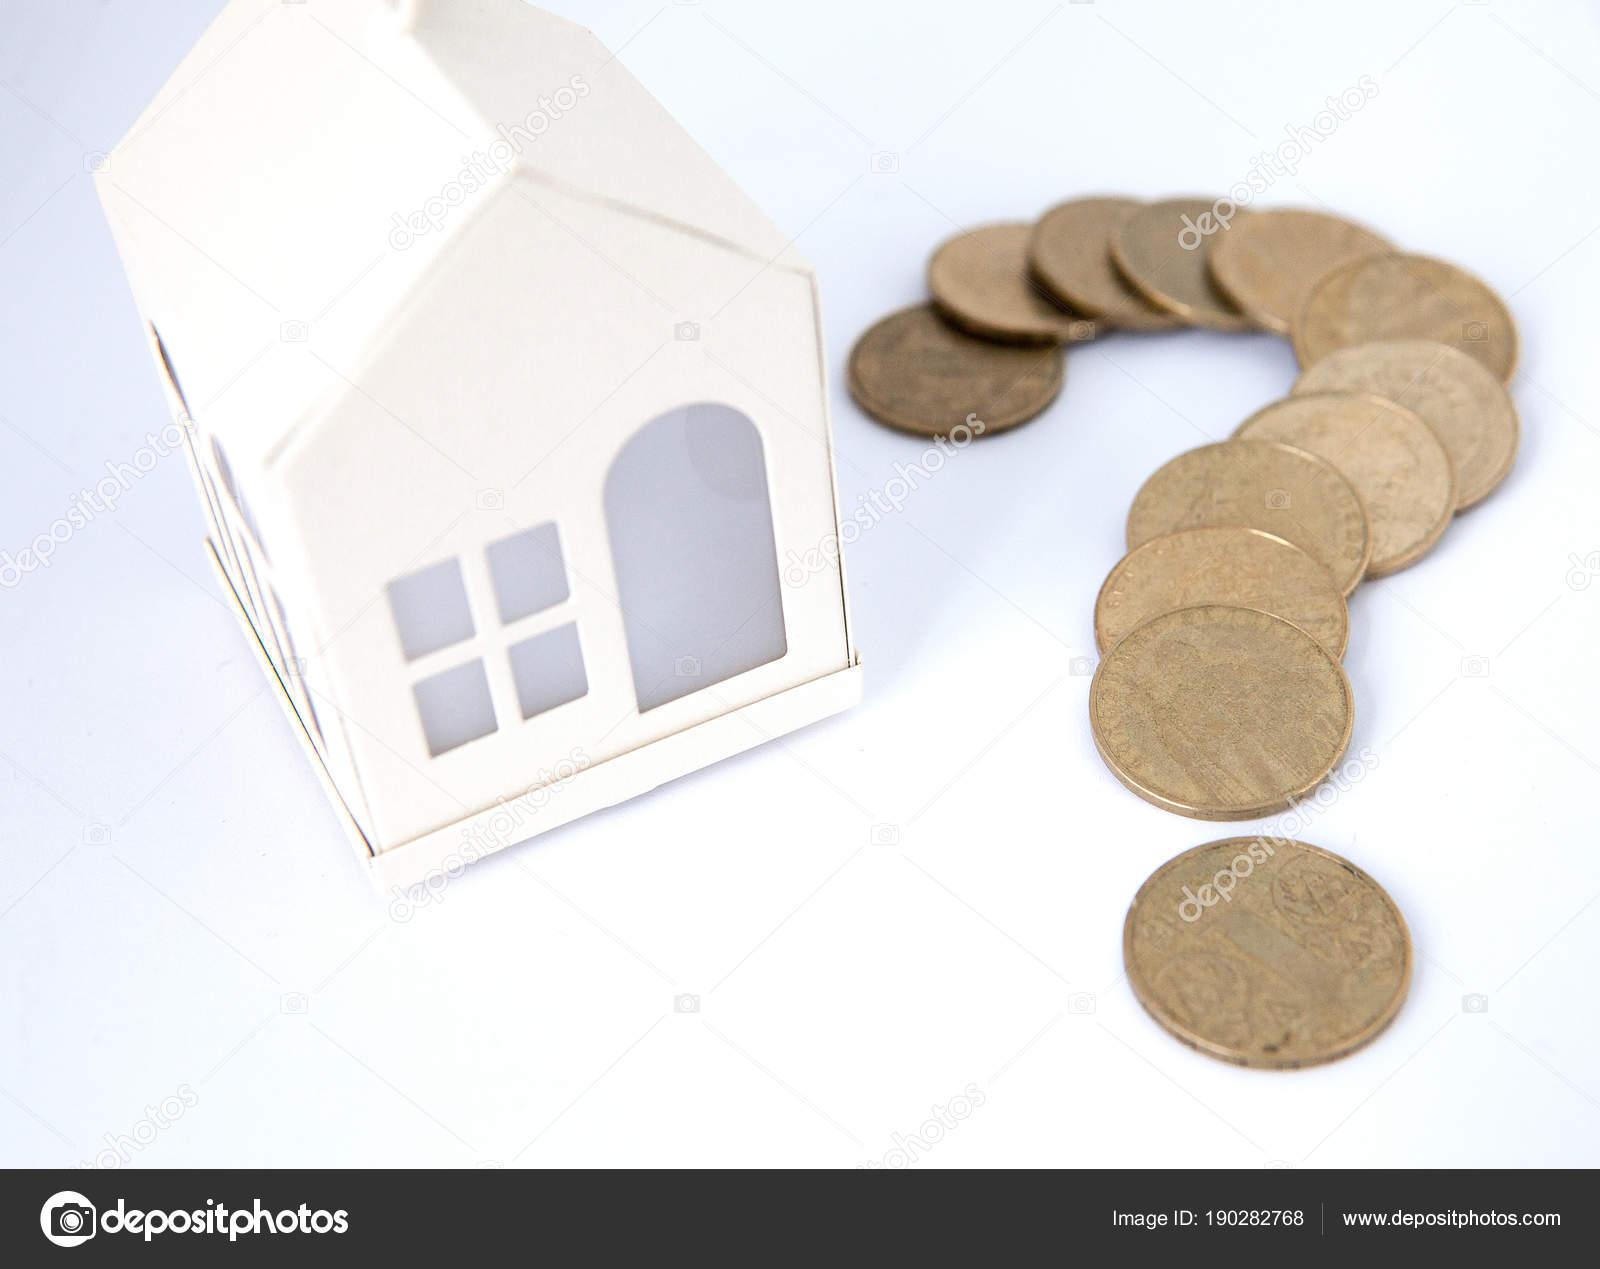 оплата по договору тинькофф банк онлайн